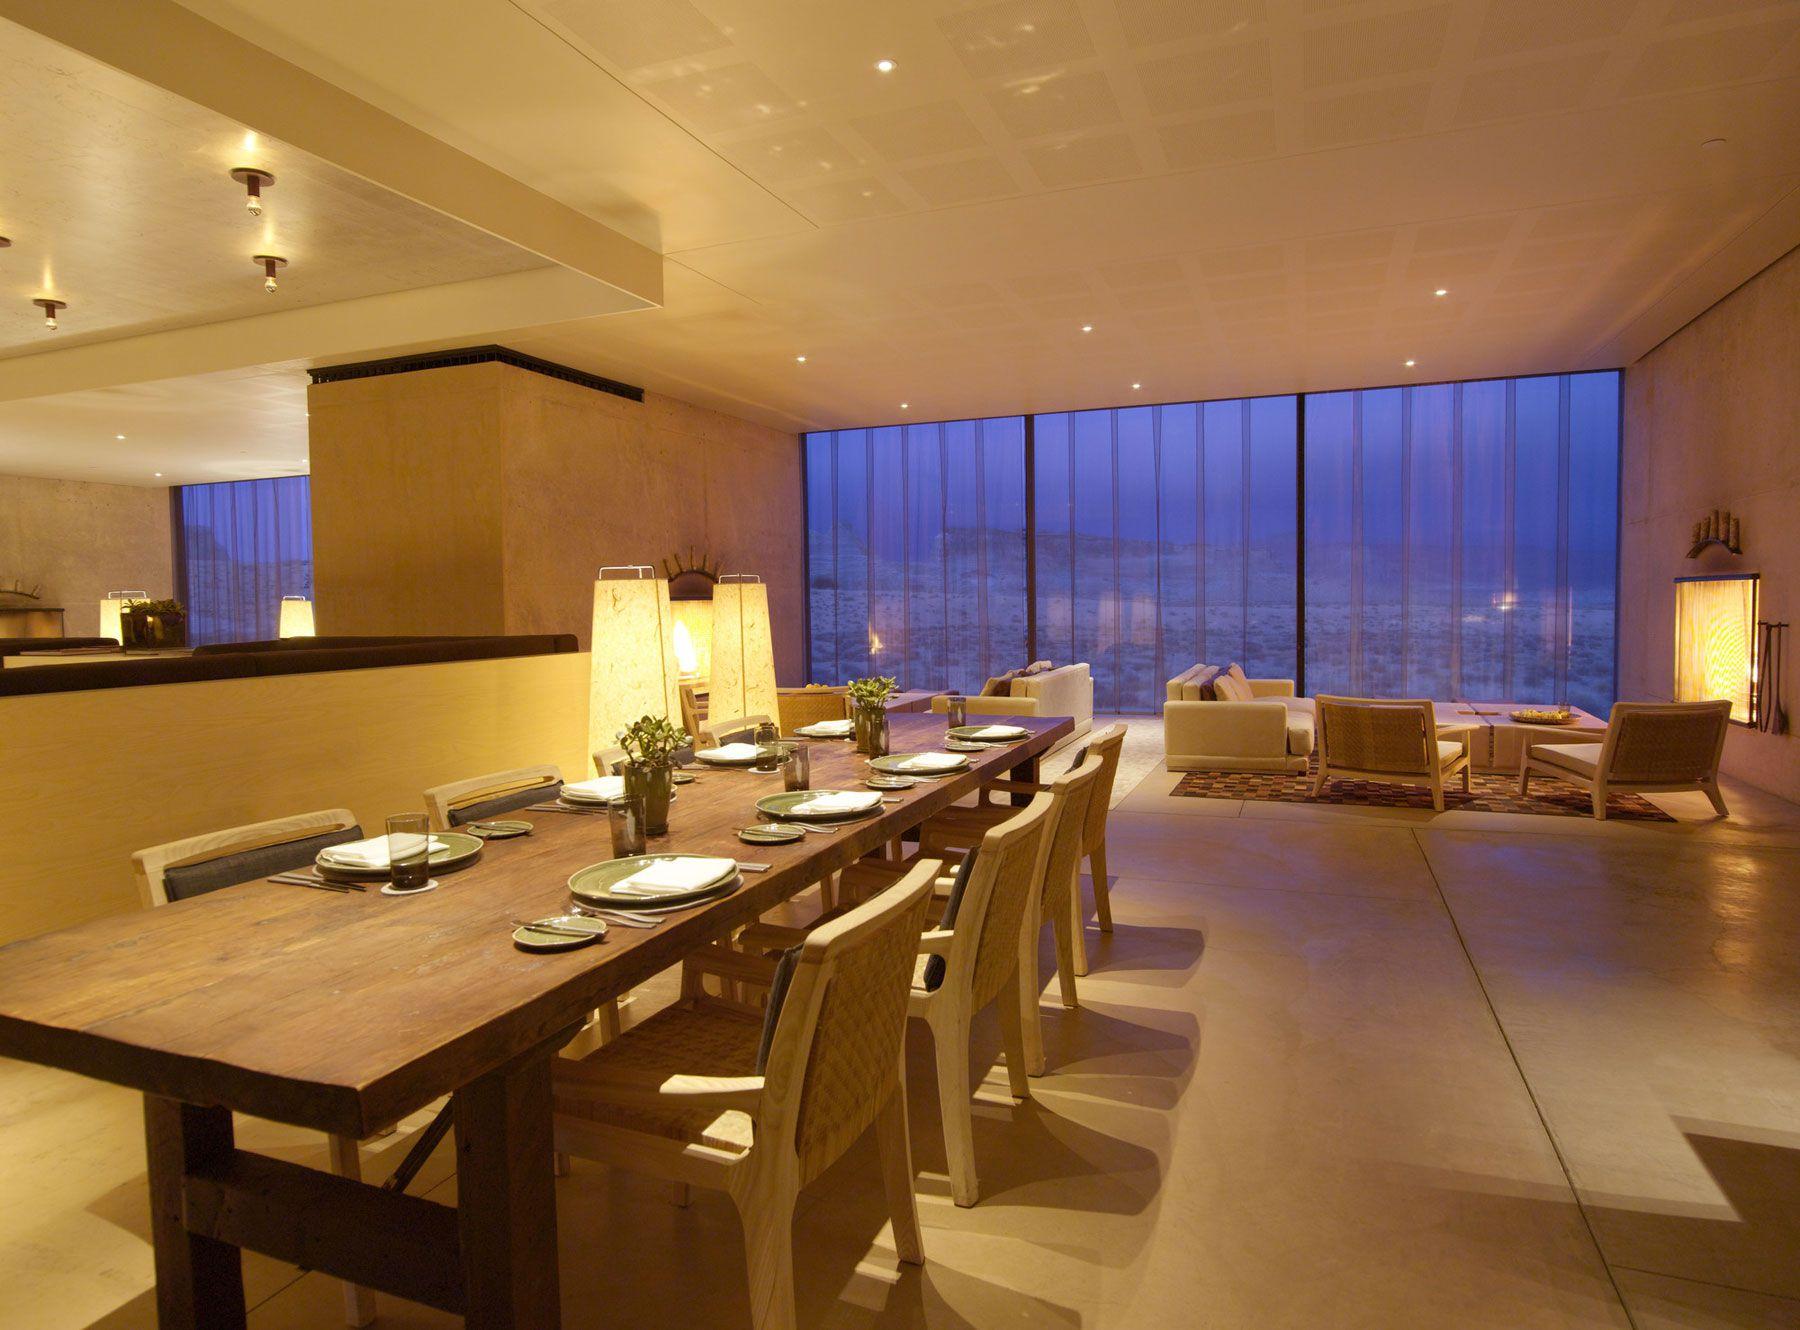 Amangiri-Luxury-Resort-Hotel-in-Canyon-Point-14-2